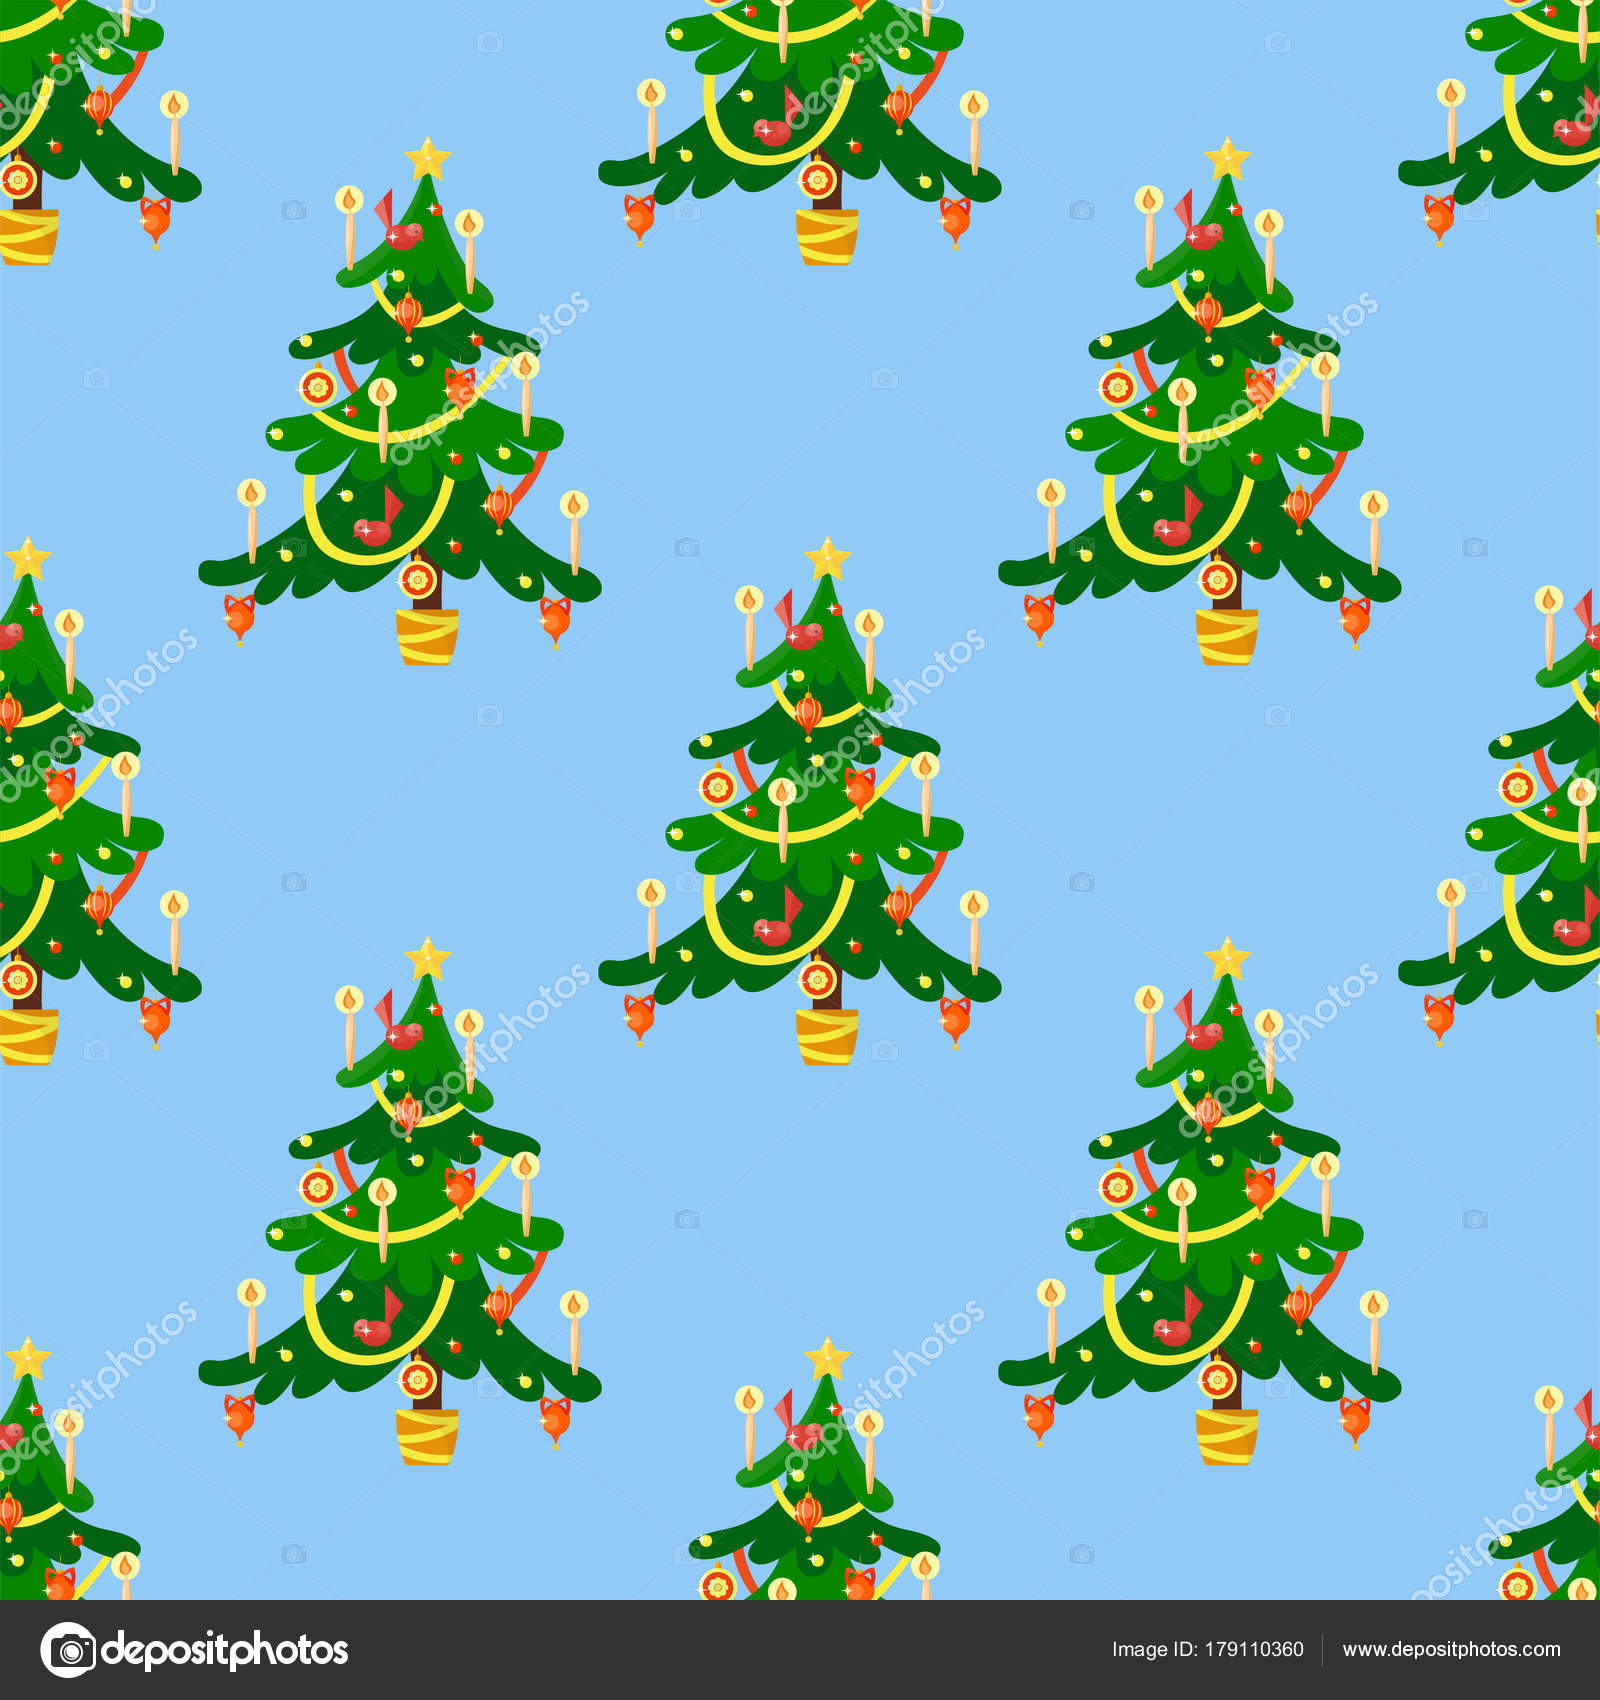 Pine Tree Cartoon Groene Winter Vakantie Naald Naadloze Patroon